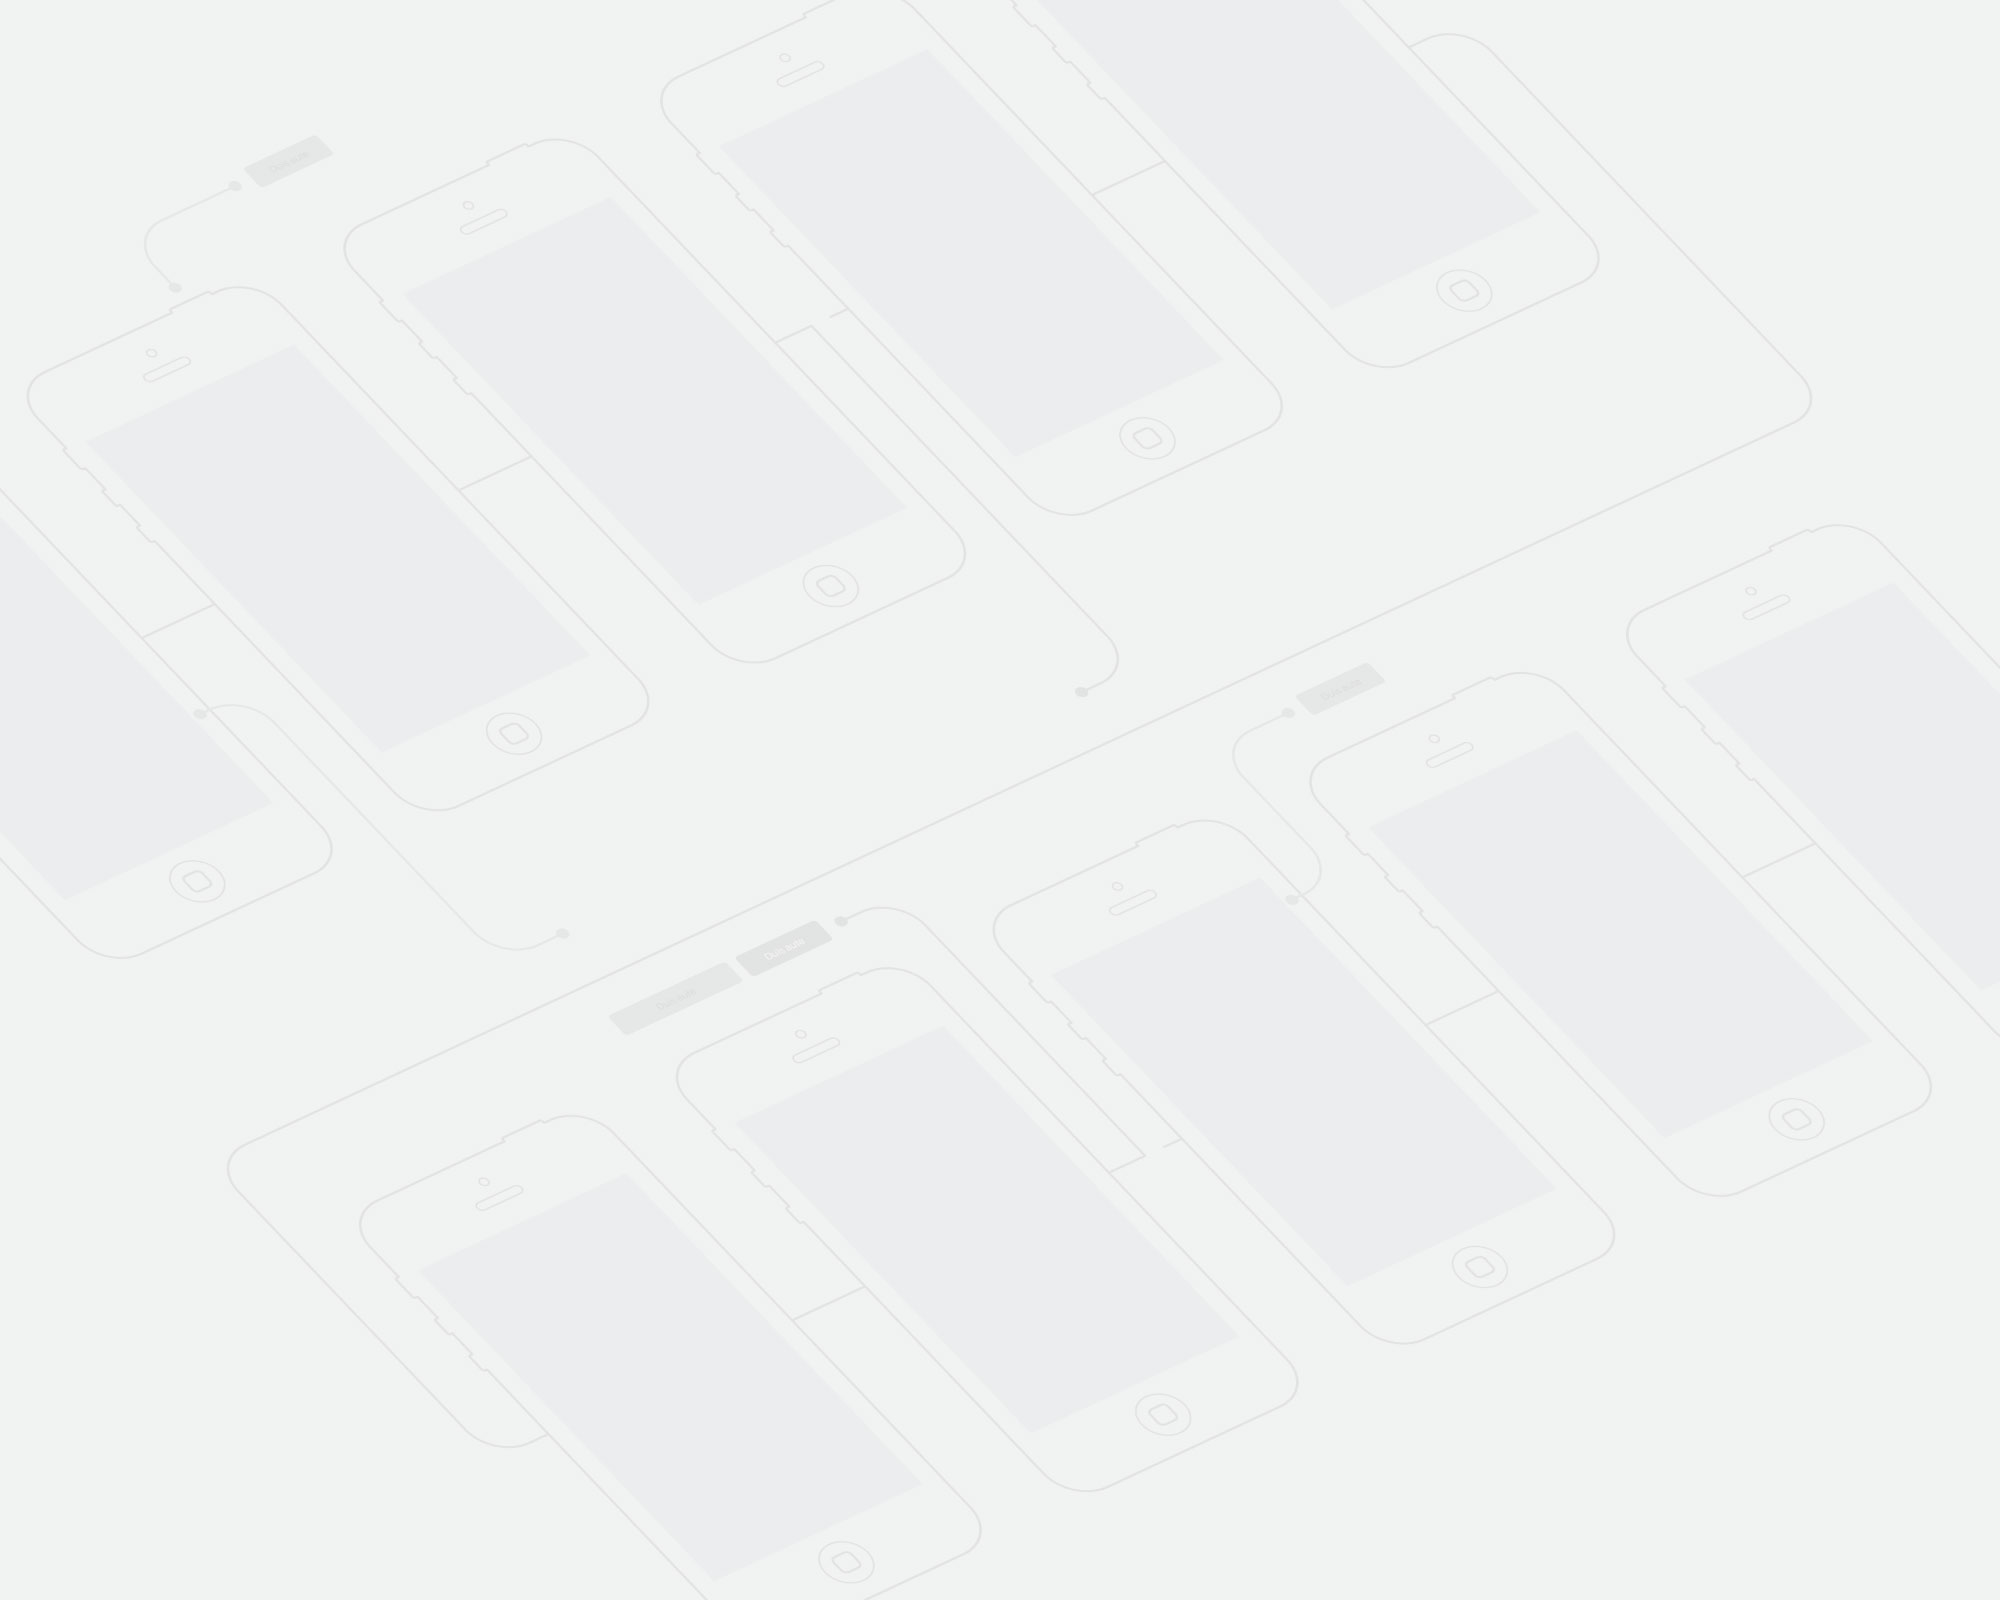 mobile_app_bkgd